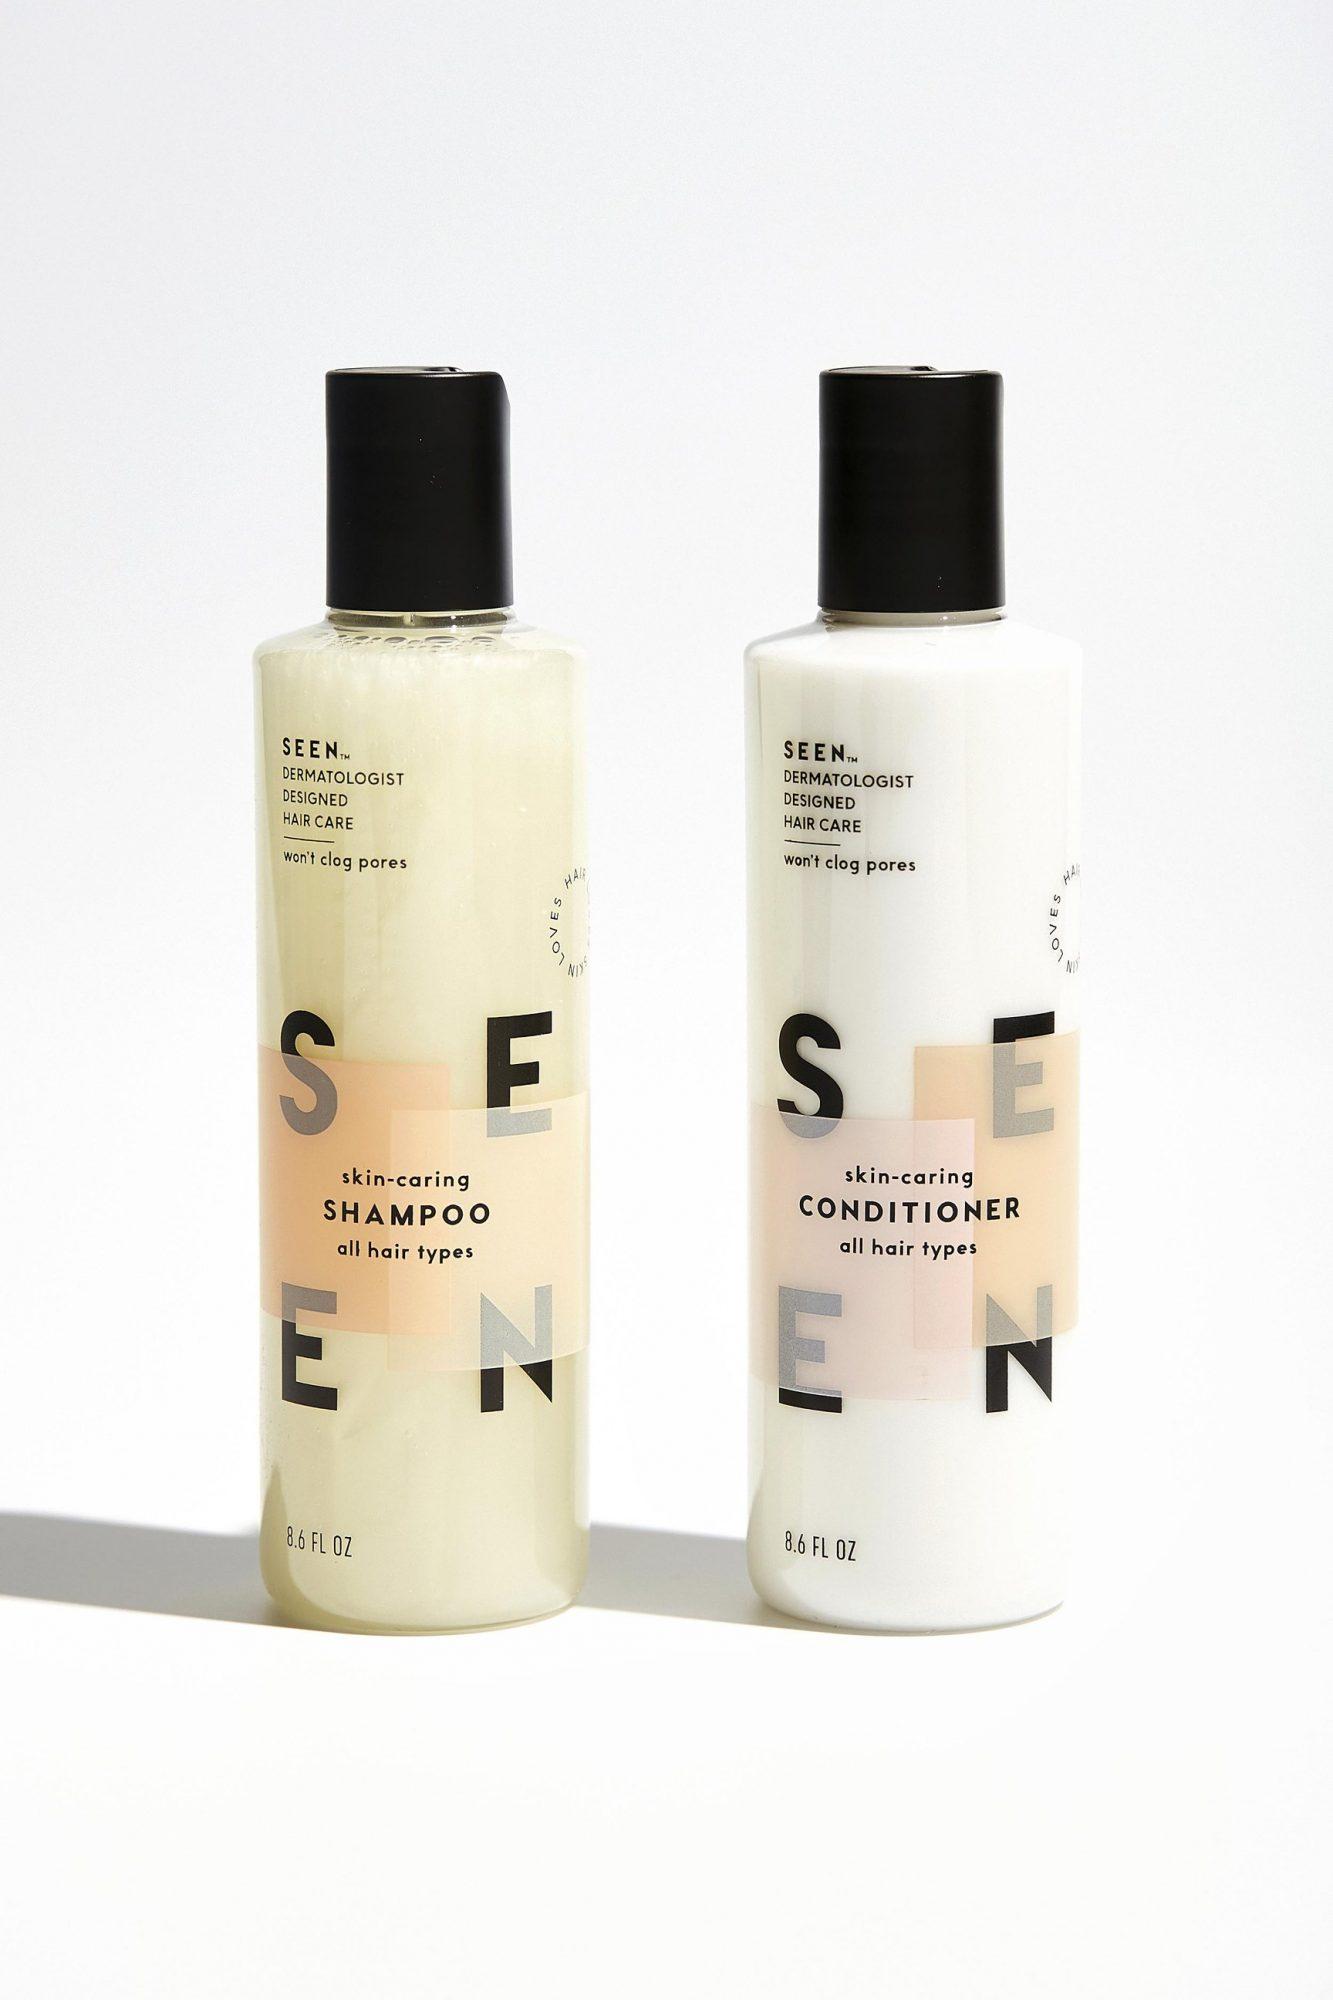 SEEN shampoo & conditioner